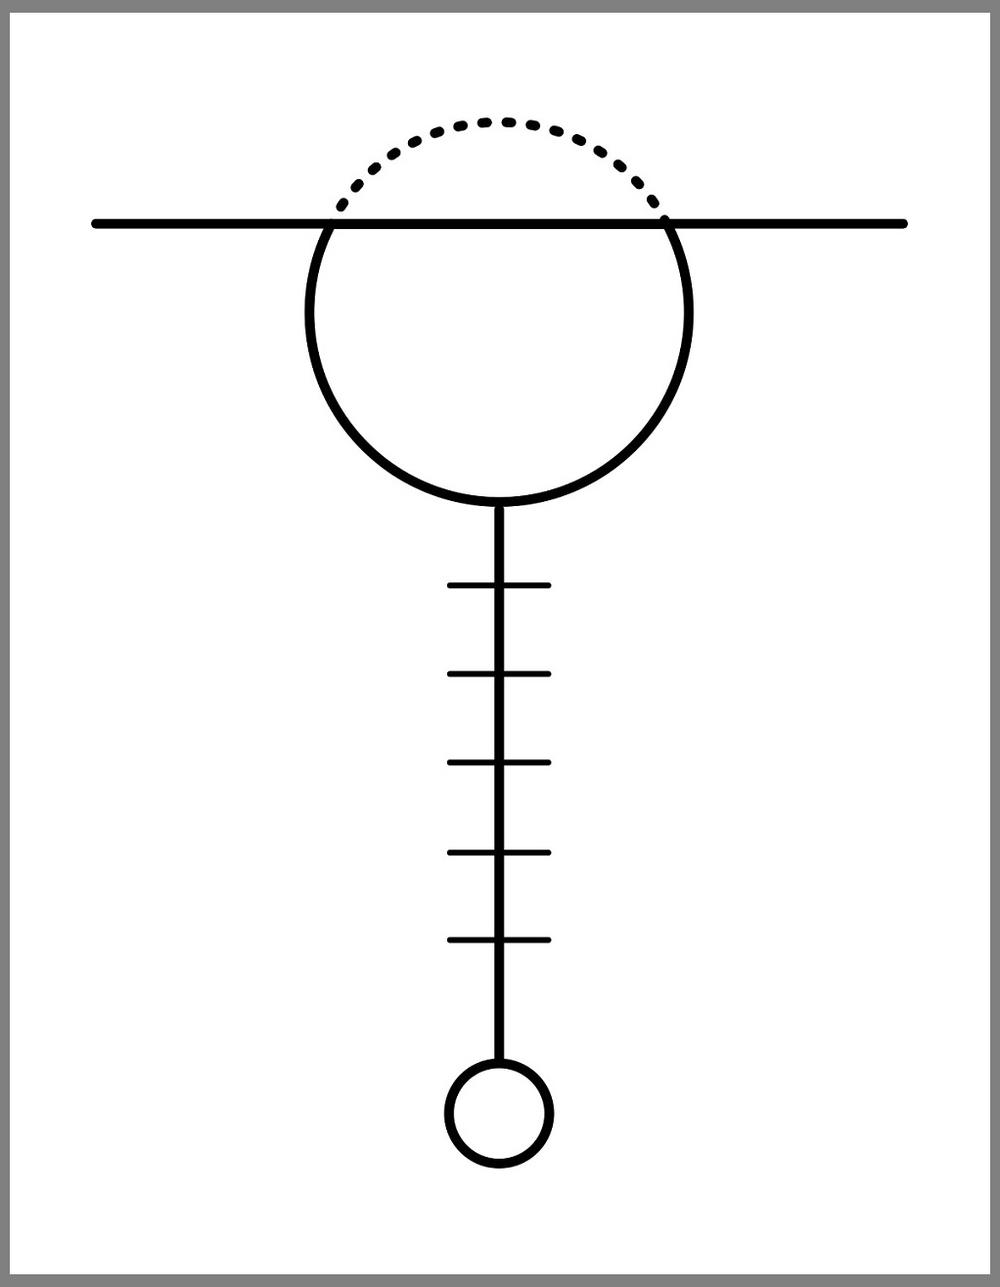 Diagram # 001B illustration